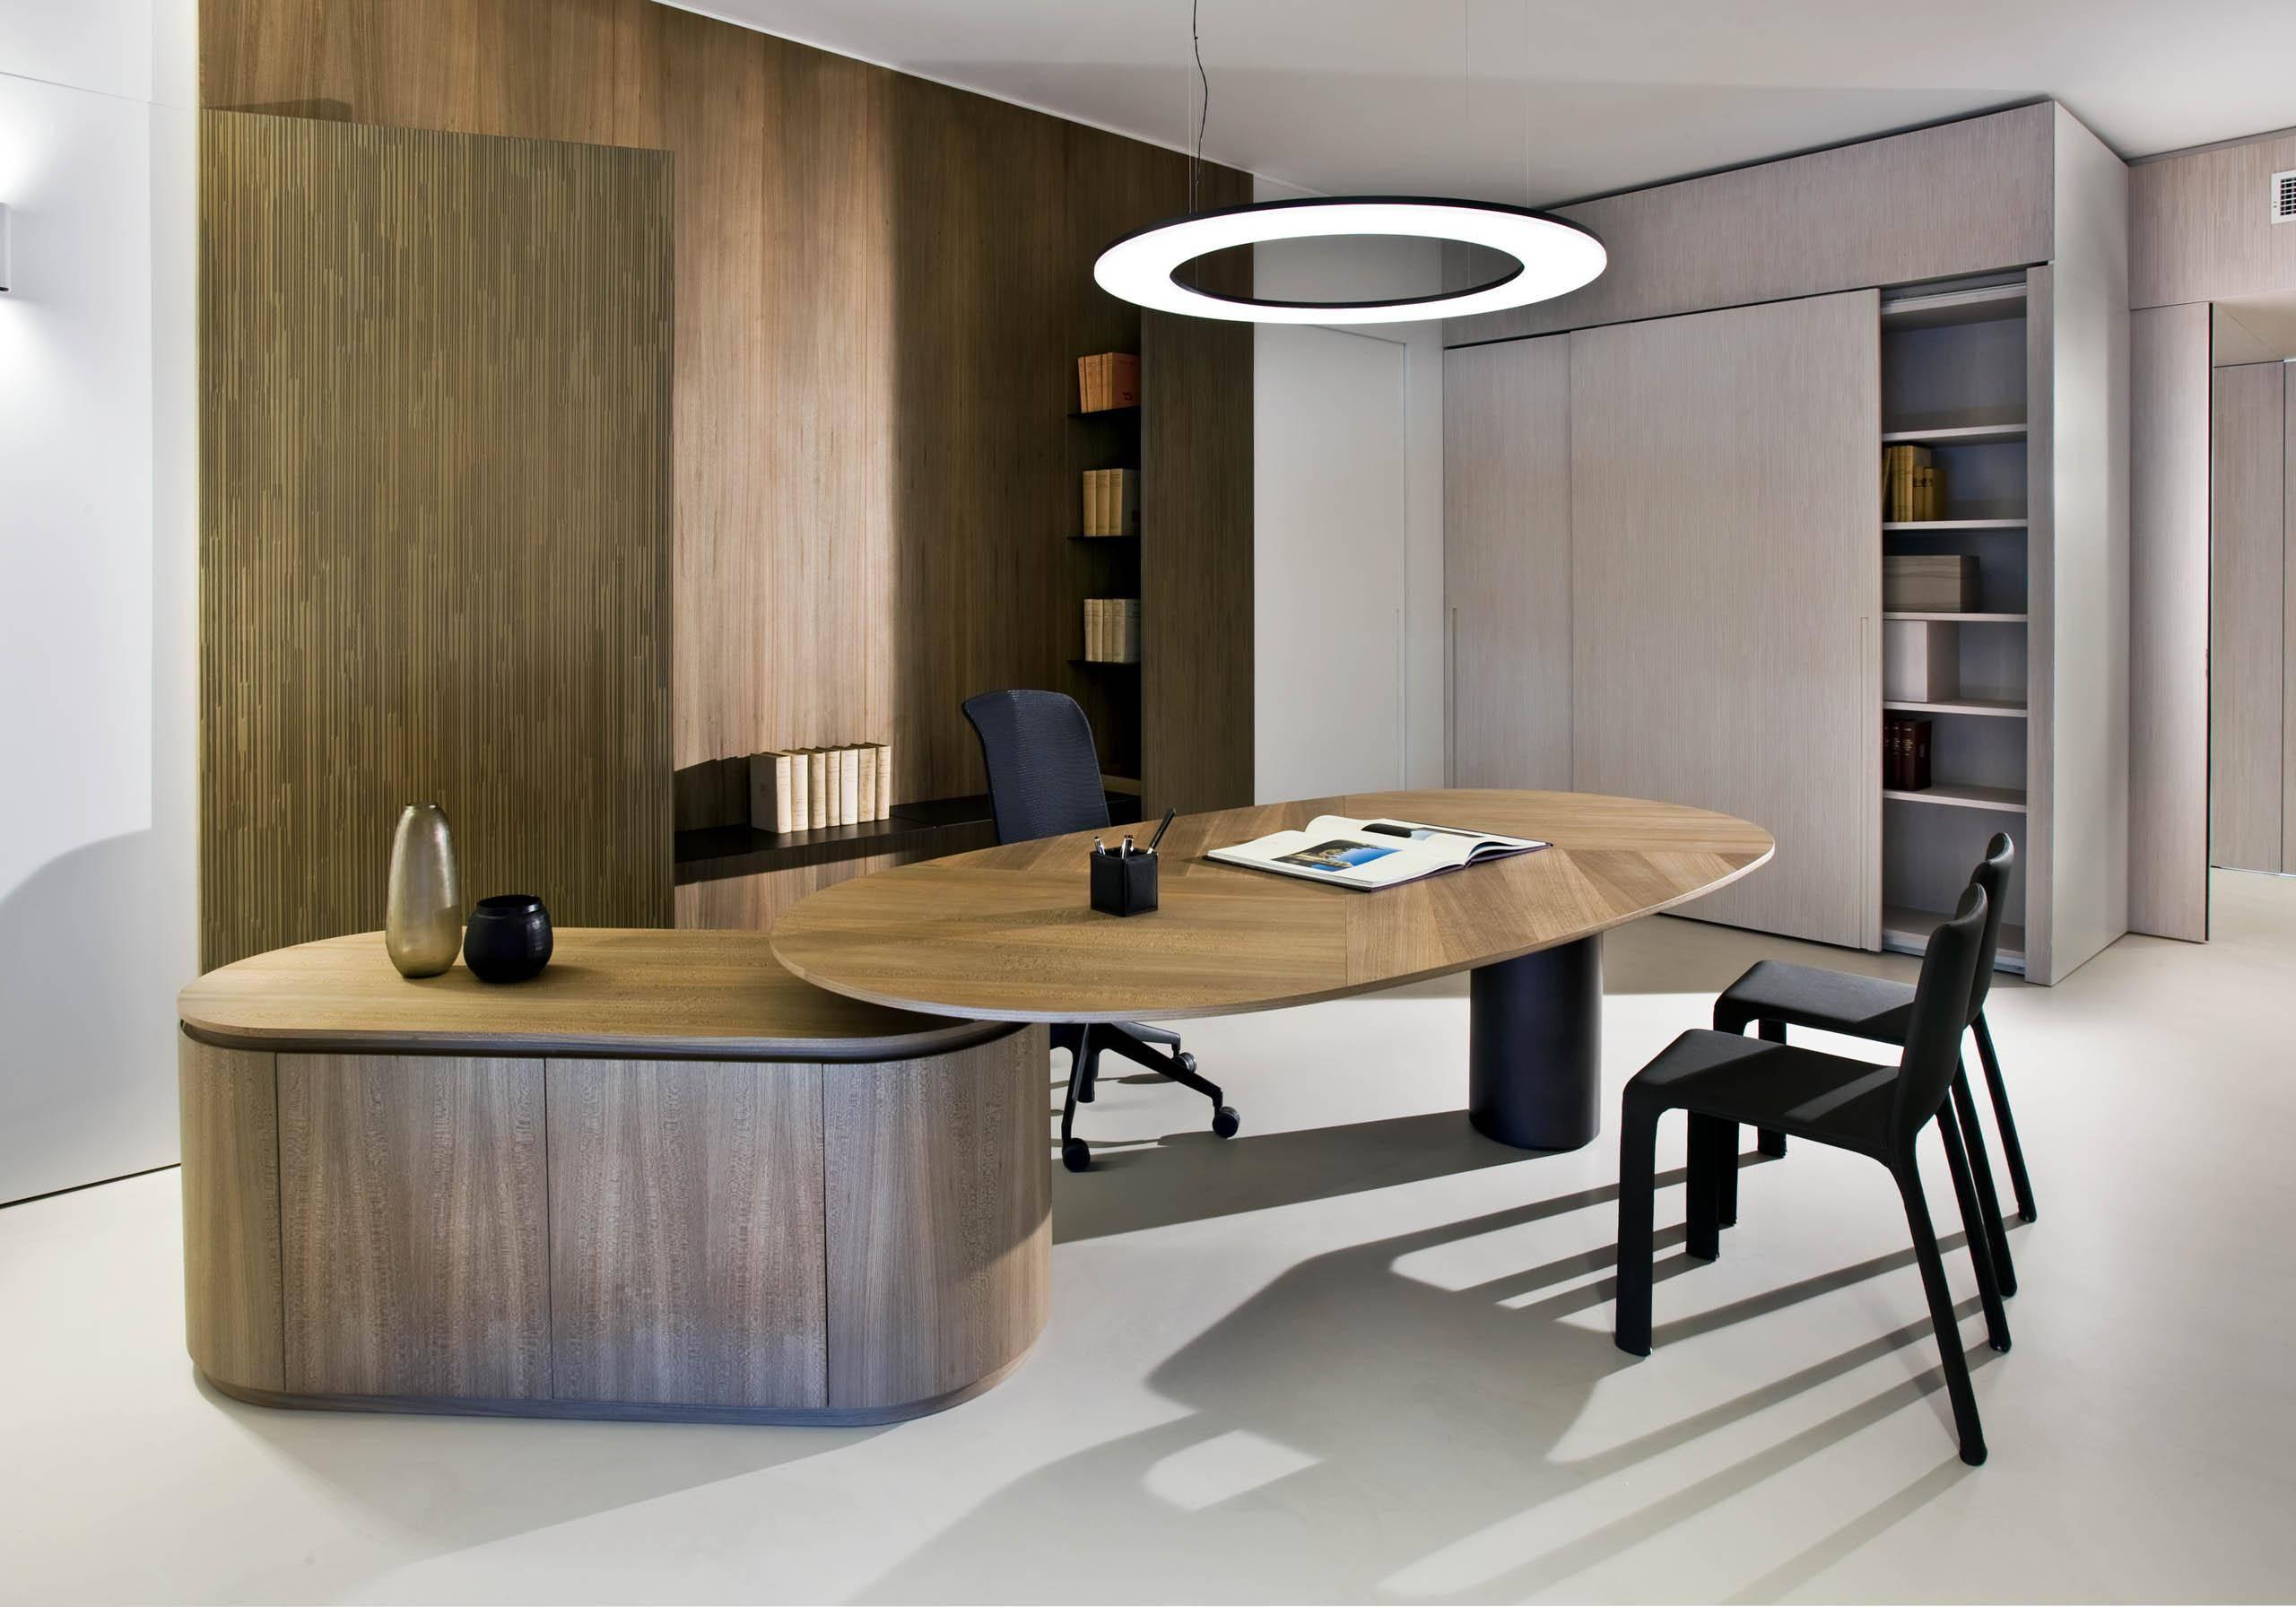 Meja kayu oval.